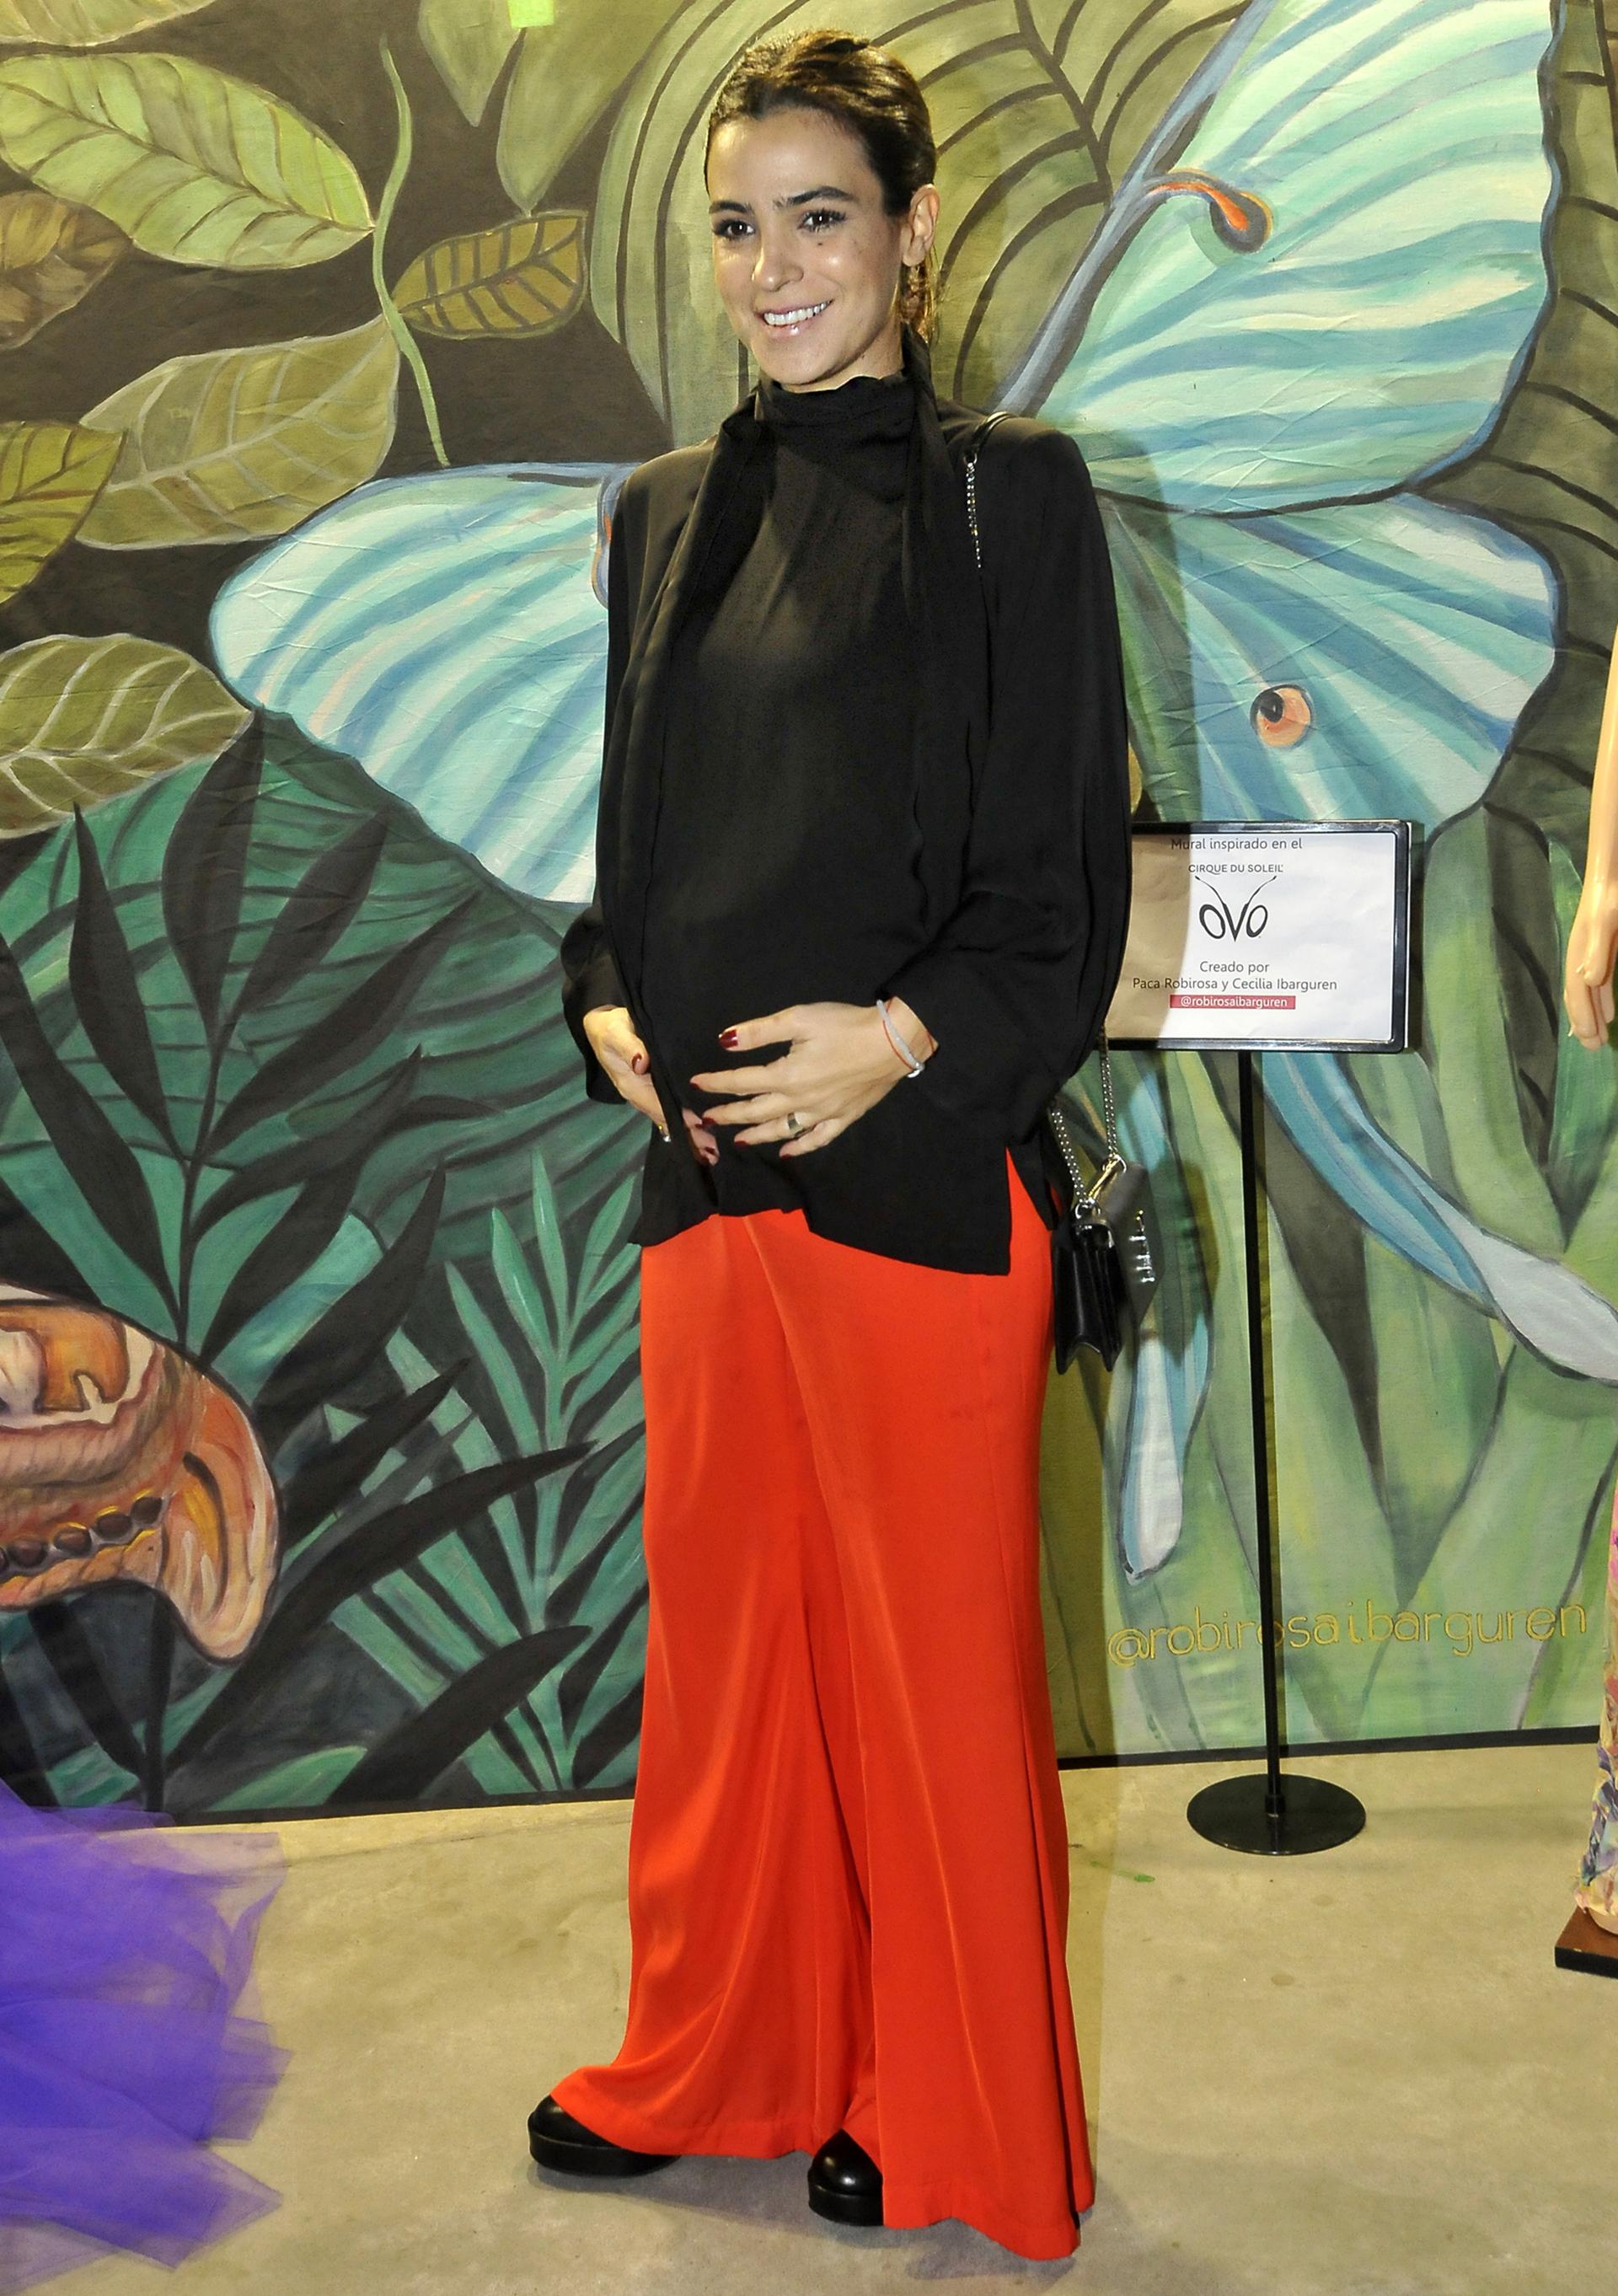 Agustina Cherri, embarazada de cinco meses